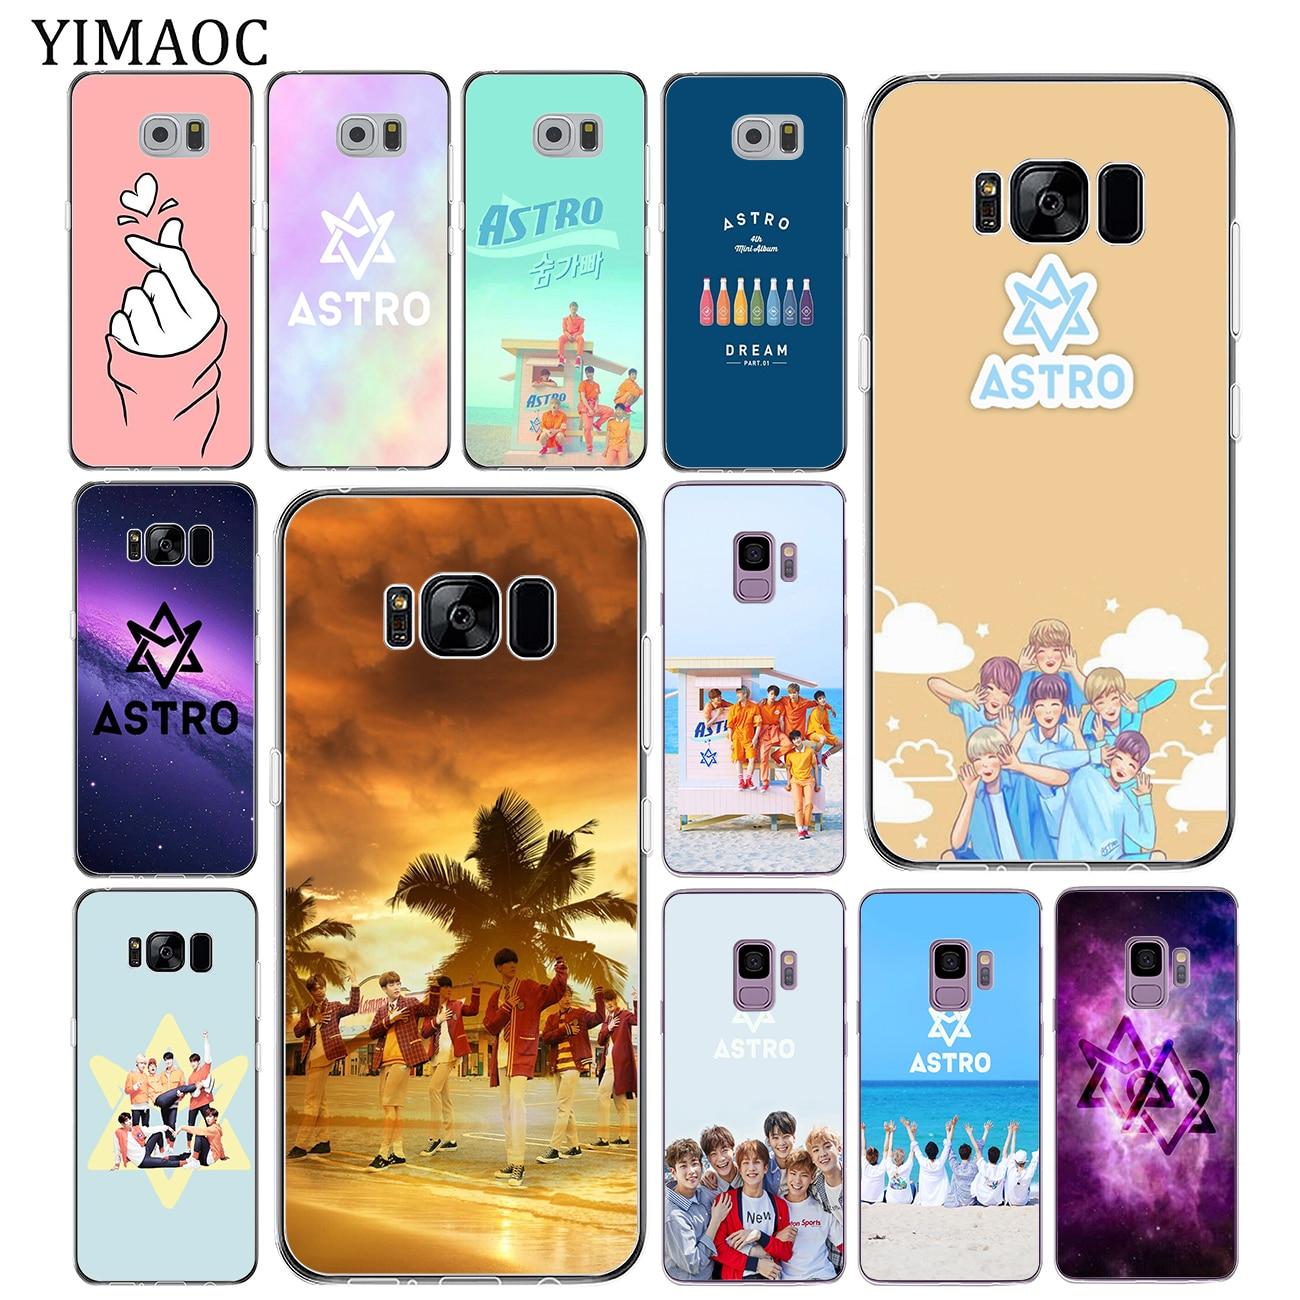 YIMAOC KPOP ASTRO Soft Tpu funda de silicona para teléfono Samsung Galaxy S10 S9 S8 Note 10 Plus S7 Edge S10e funda trasera transparente